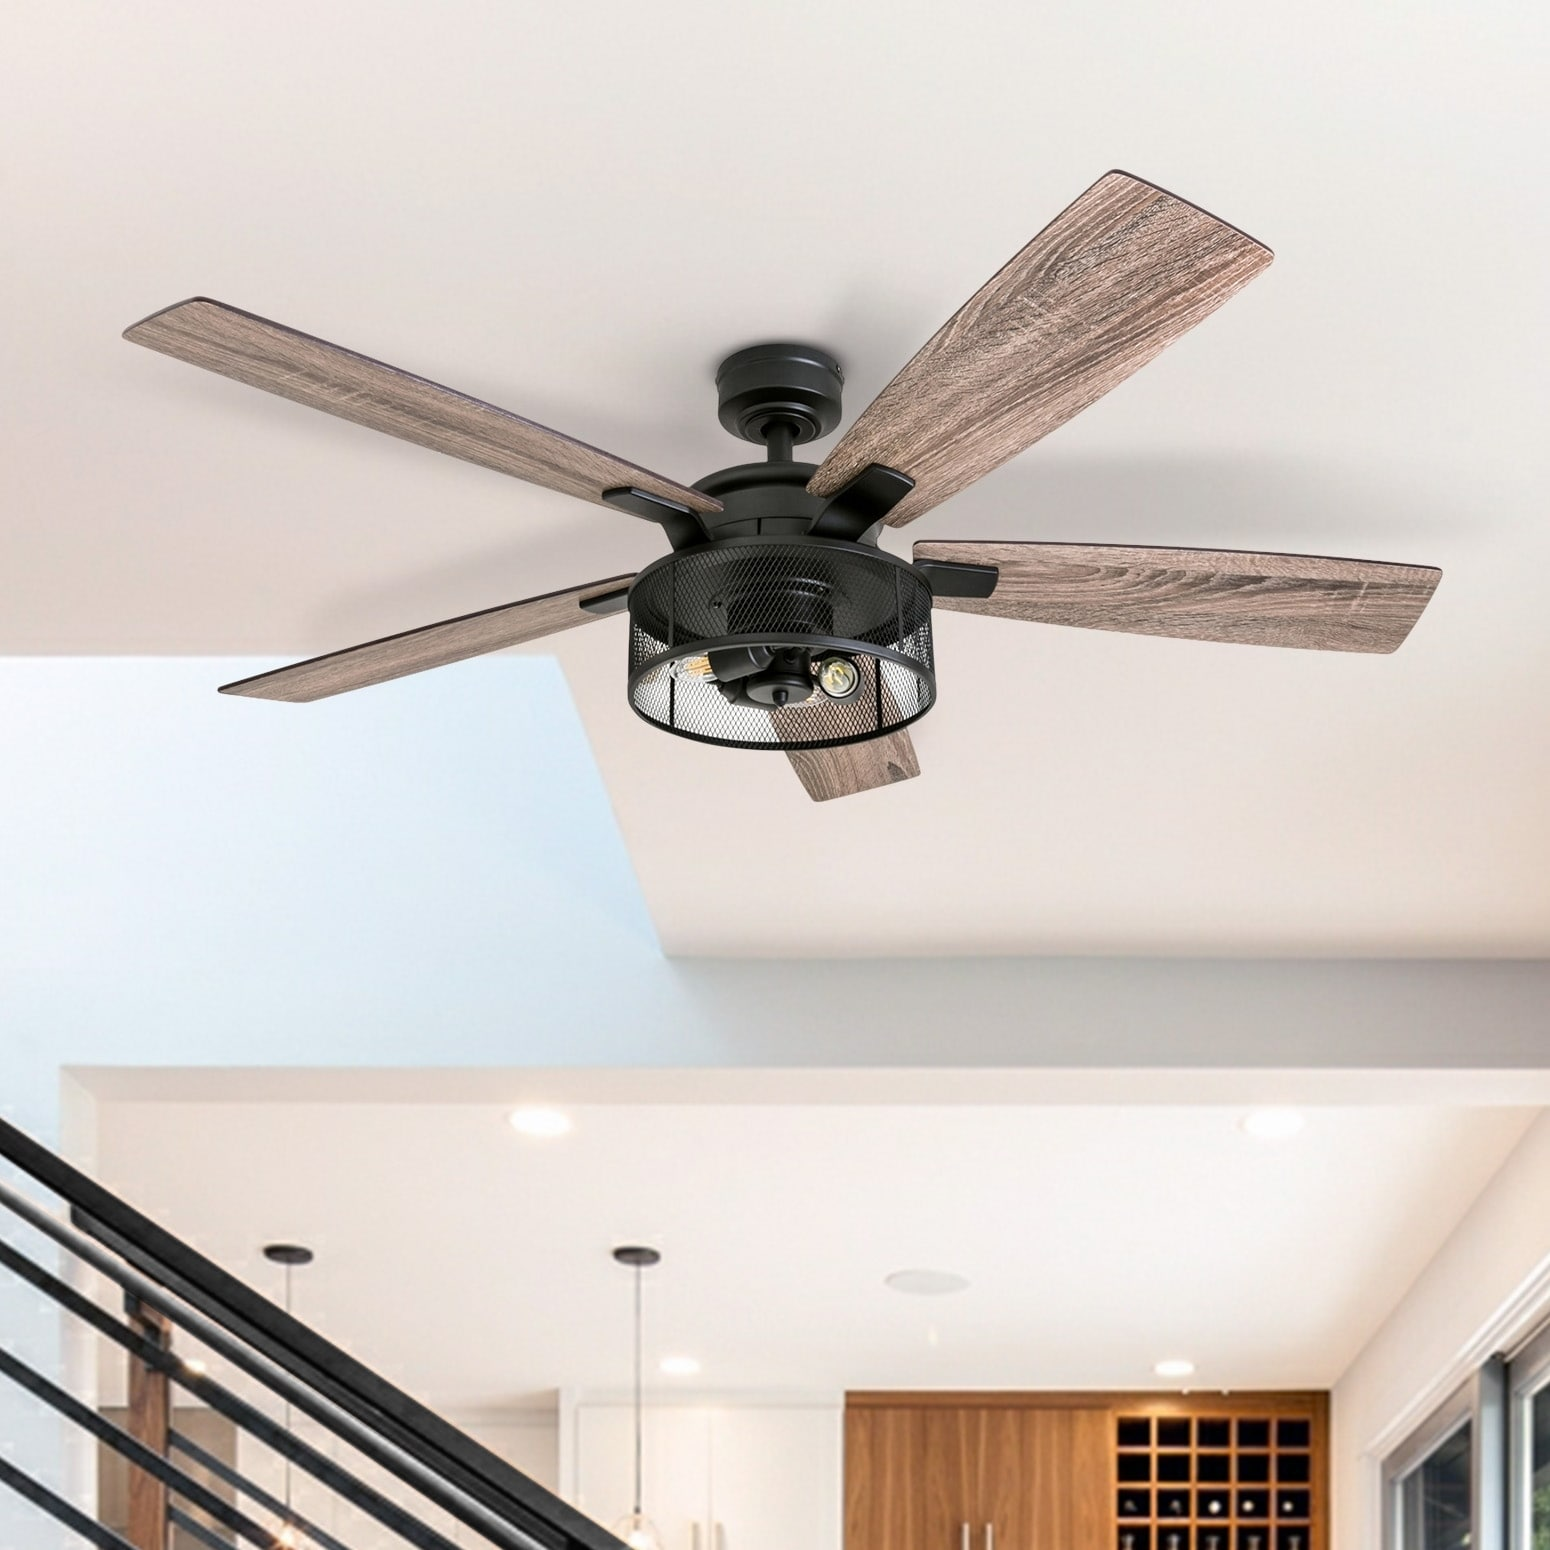 Buy Flush Mount Ceiling Fans Online at Overstock | Our Best Lighting ...